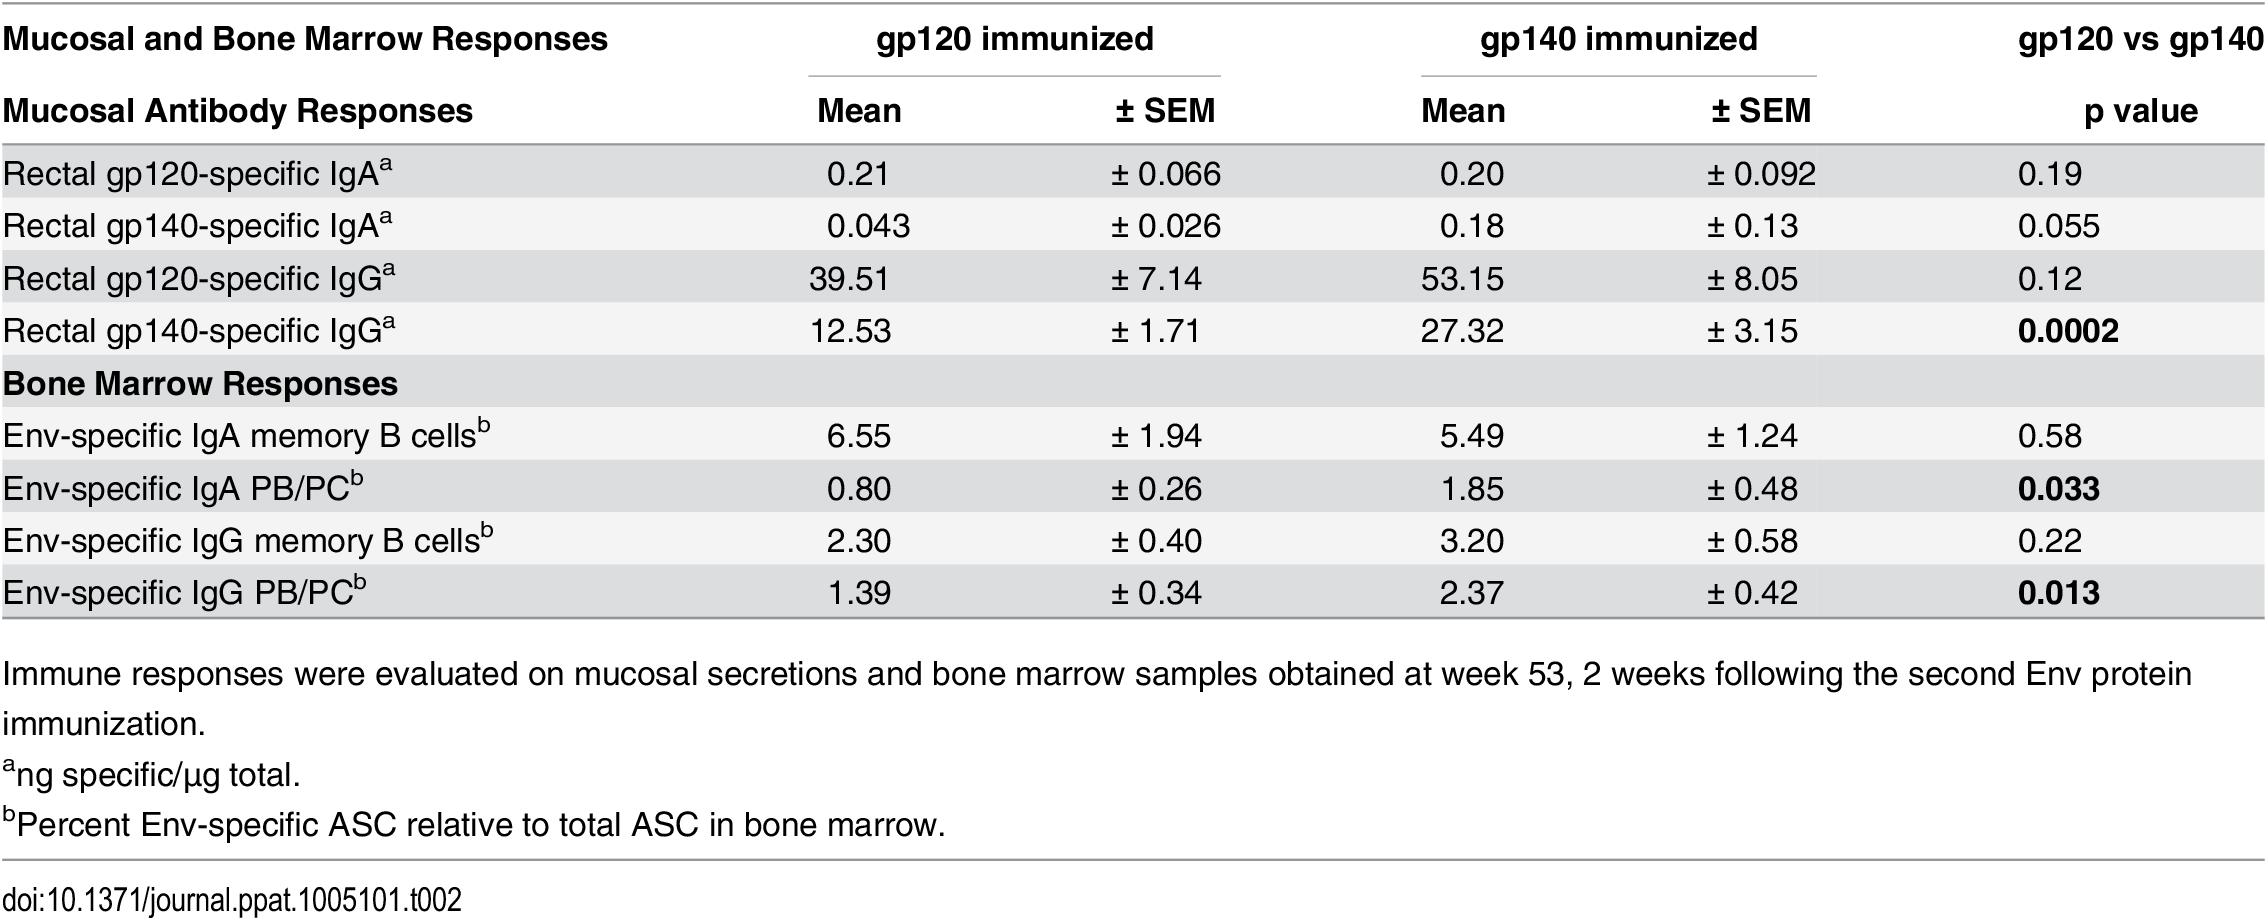 Comparative immunogenicity of monomeric gp120 and oligomeric gp140: mucosal and bone marrow responses.